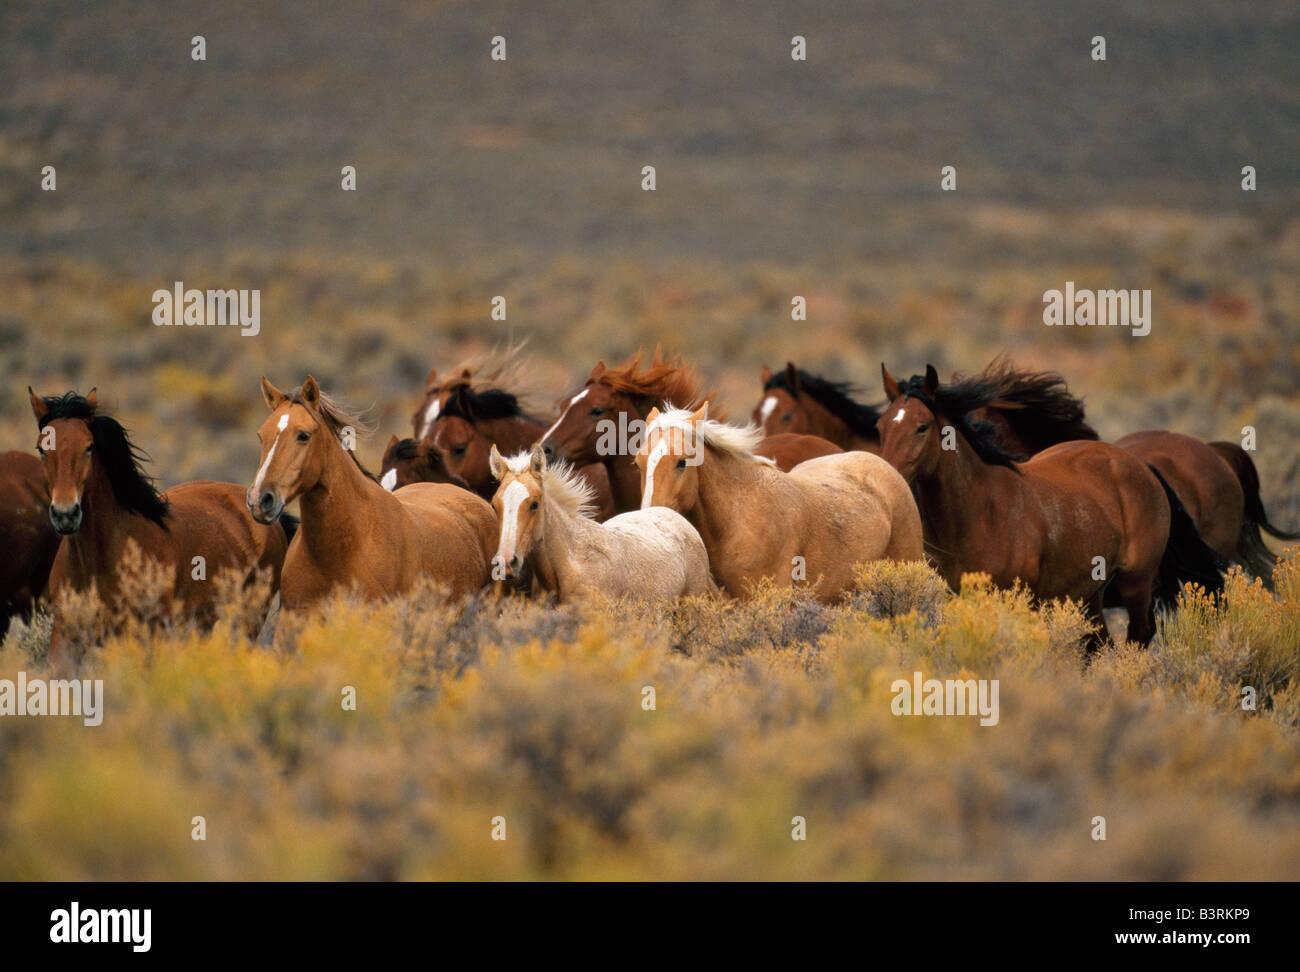 Herd Of Wild Horses Running High Desert Stock Photo Alamy